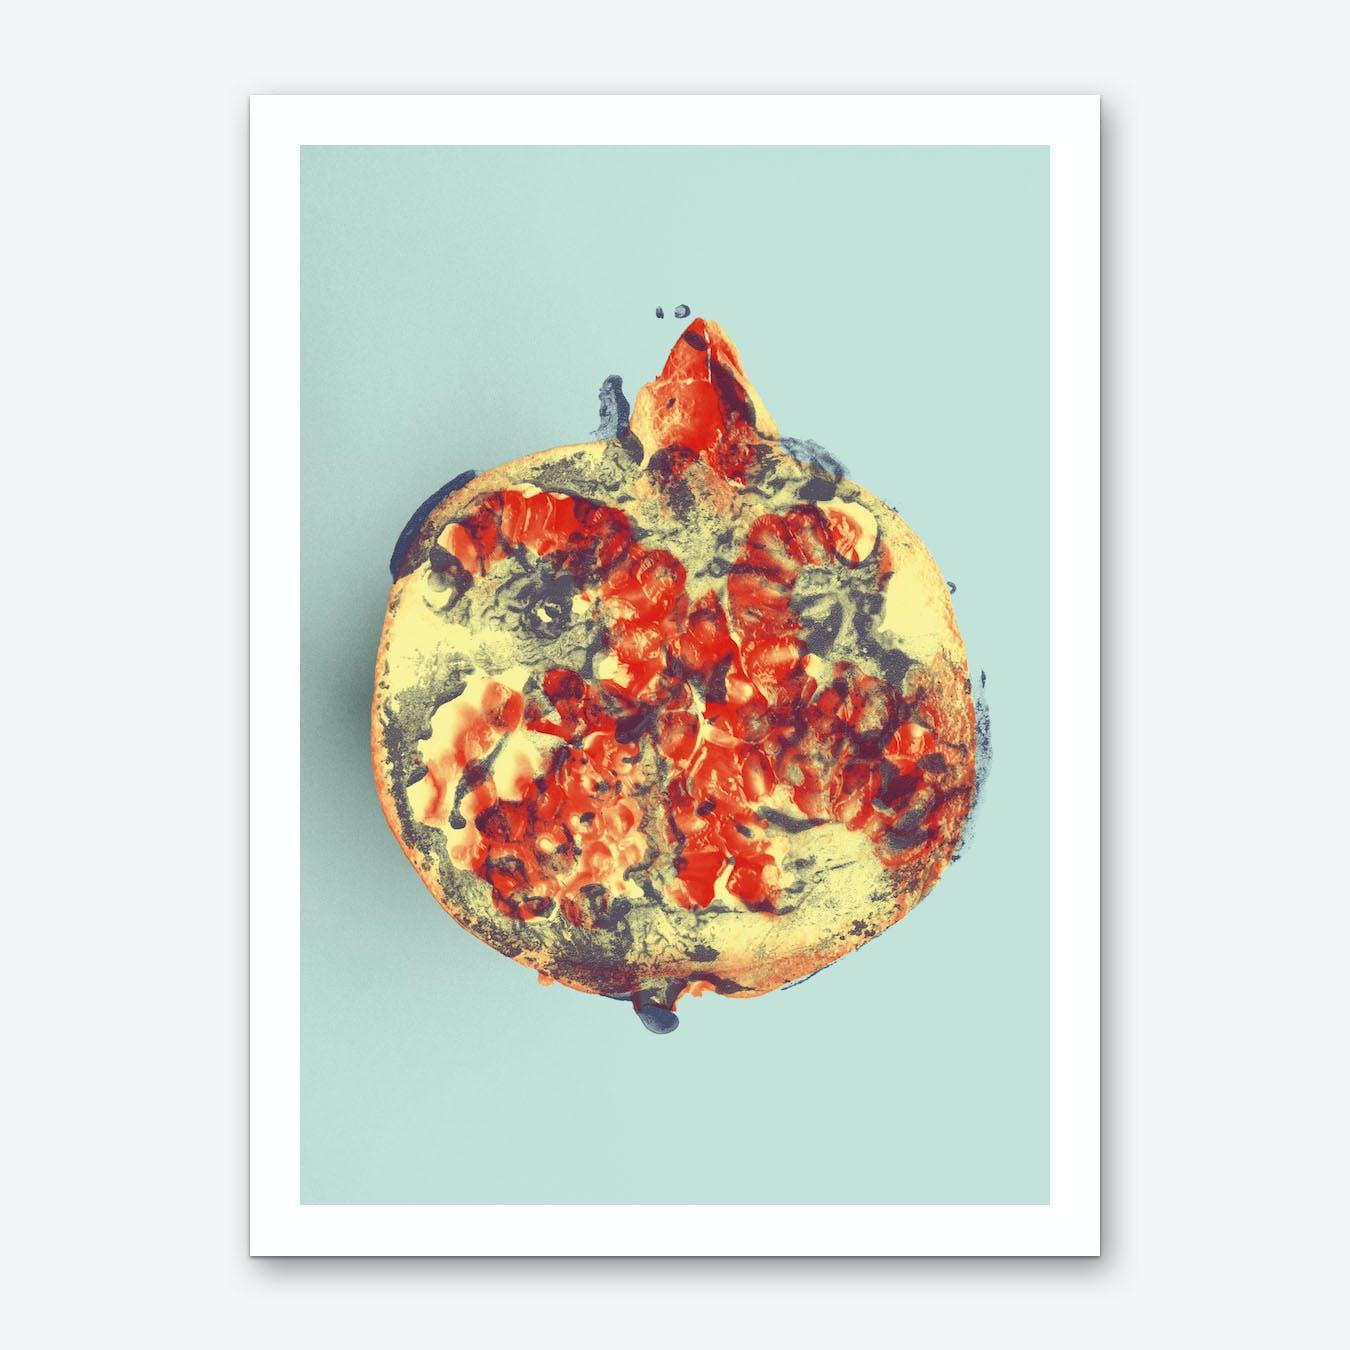 Ode aux Légumes Grenade Art Print